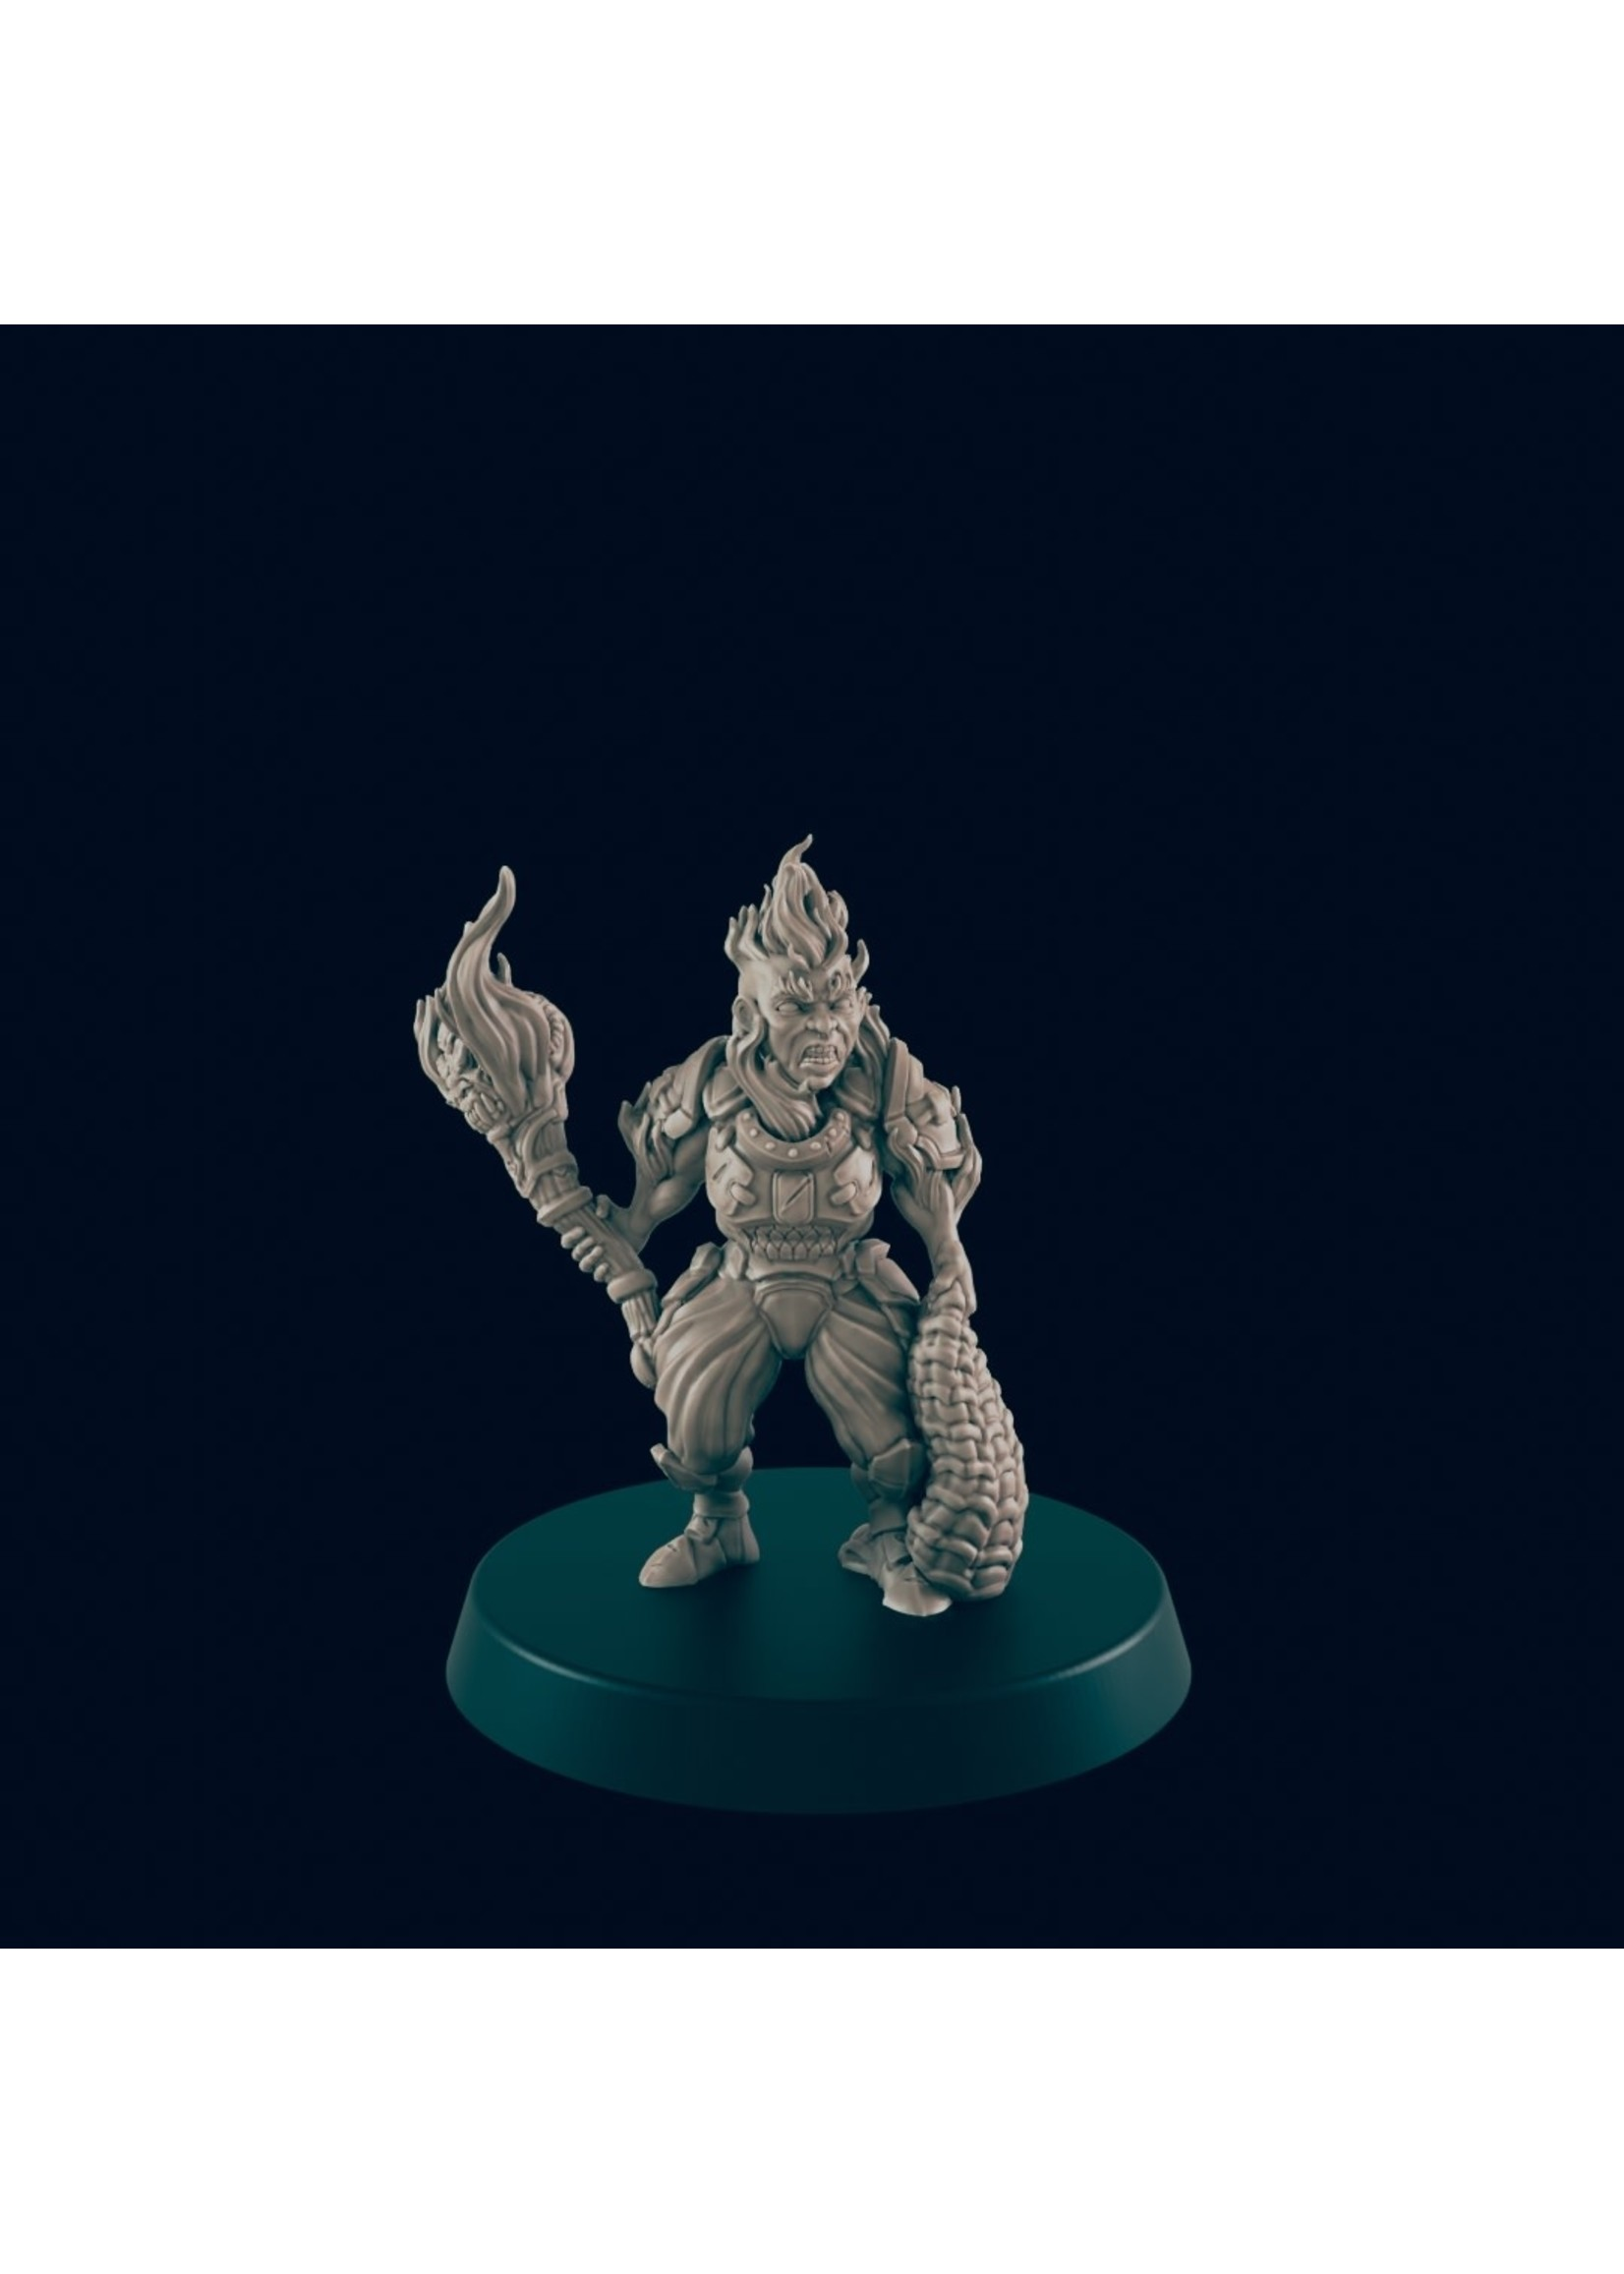 3D Printed Miniature - Azer Female - Dungeons & Dragons - Beasts and Baddies KS